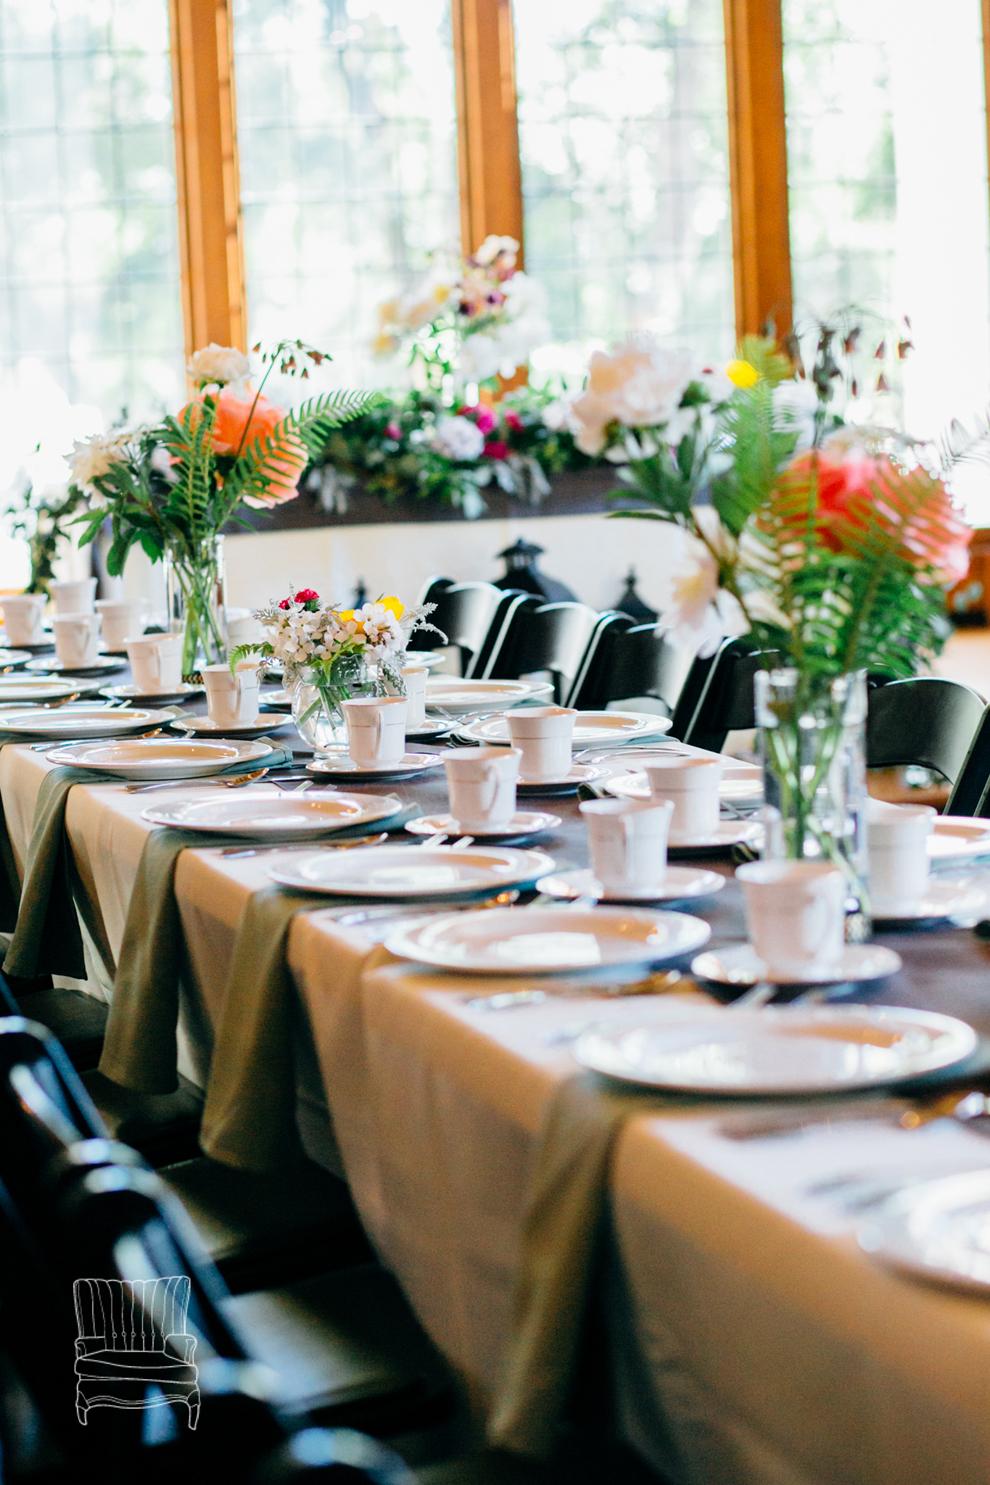 017-lairmont-manor-bellingham-washington-wedding-venue-katheryn-moran-photography-marketing.jpg